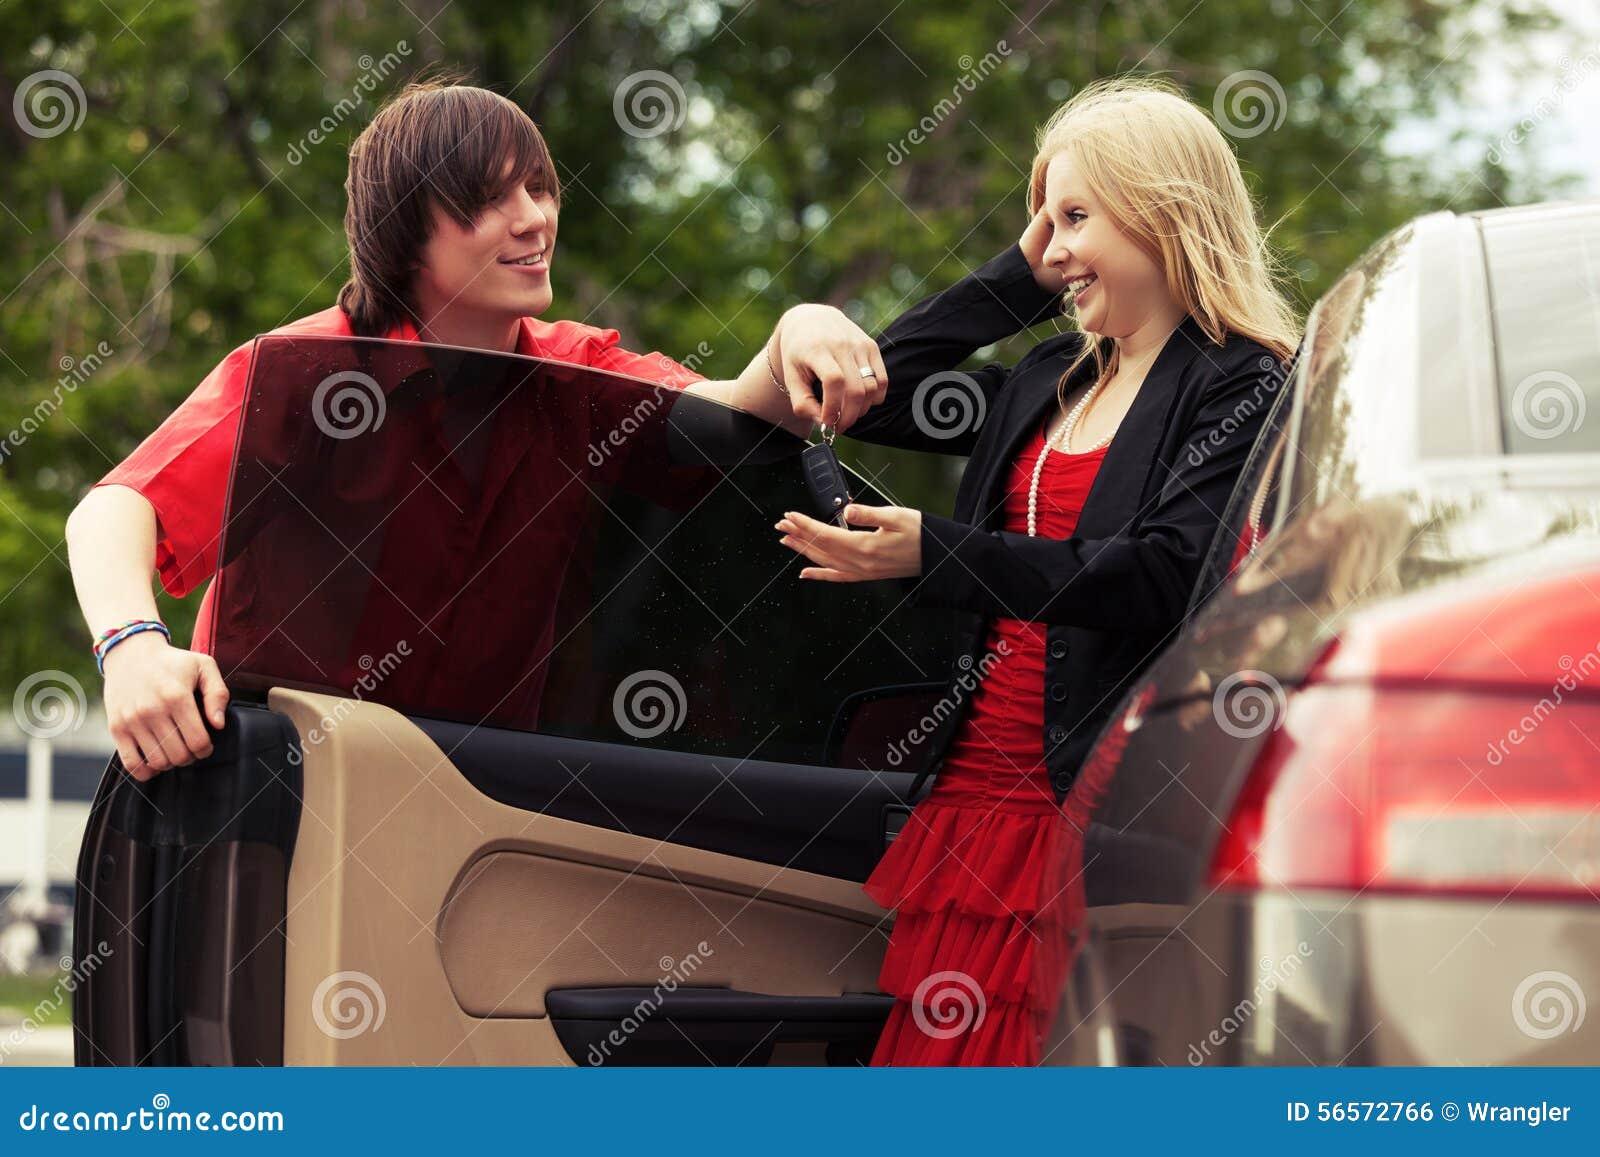 Download Ευτυχές νέο ζεύγος με το νέο αυτοκίνητο Στοκ Εικόνες - εικόνα από πόλη, κυρία: 56572766